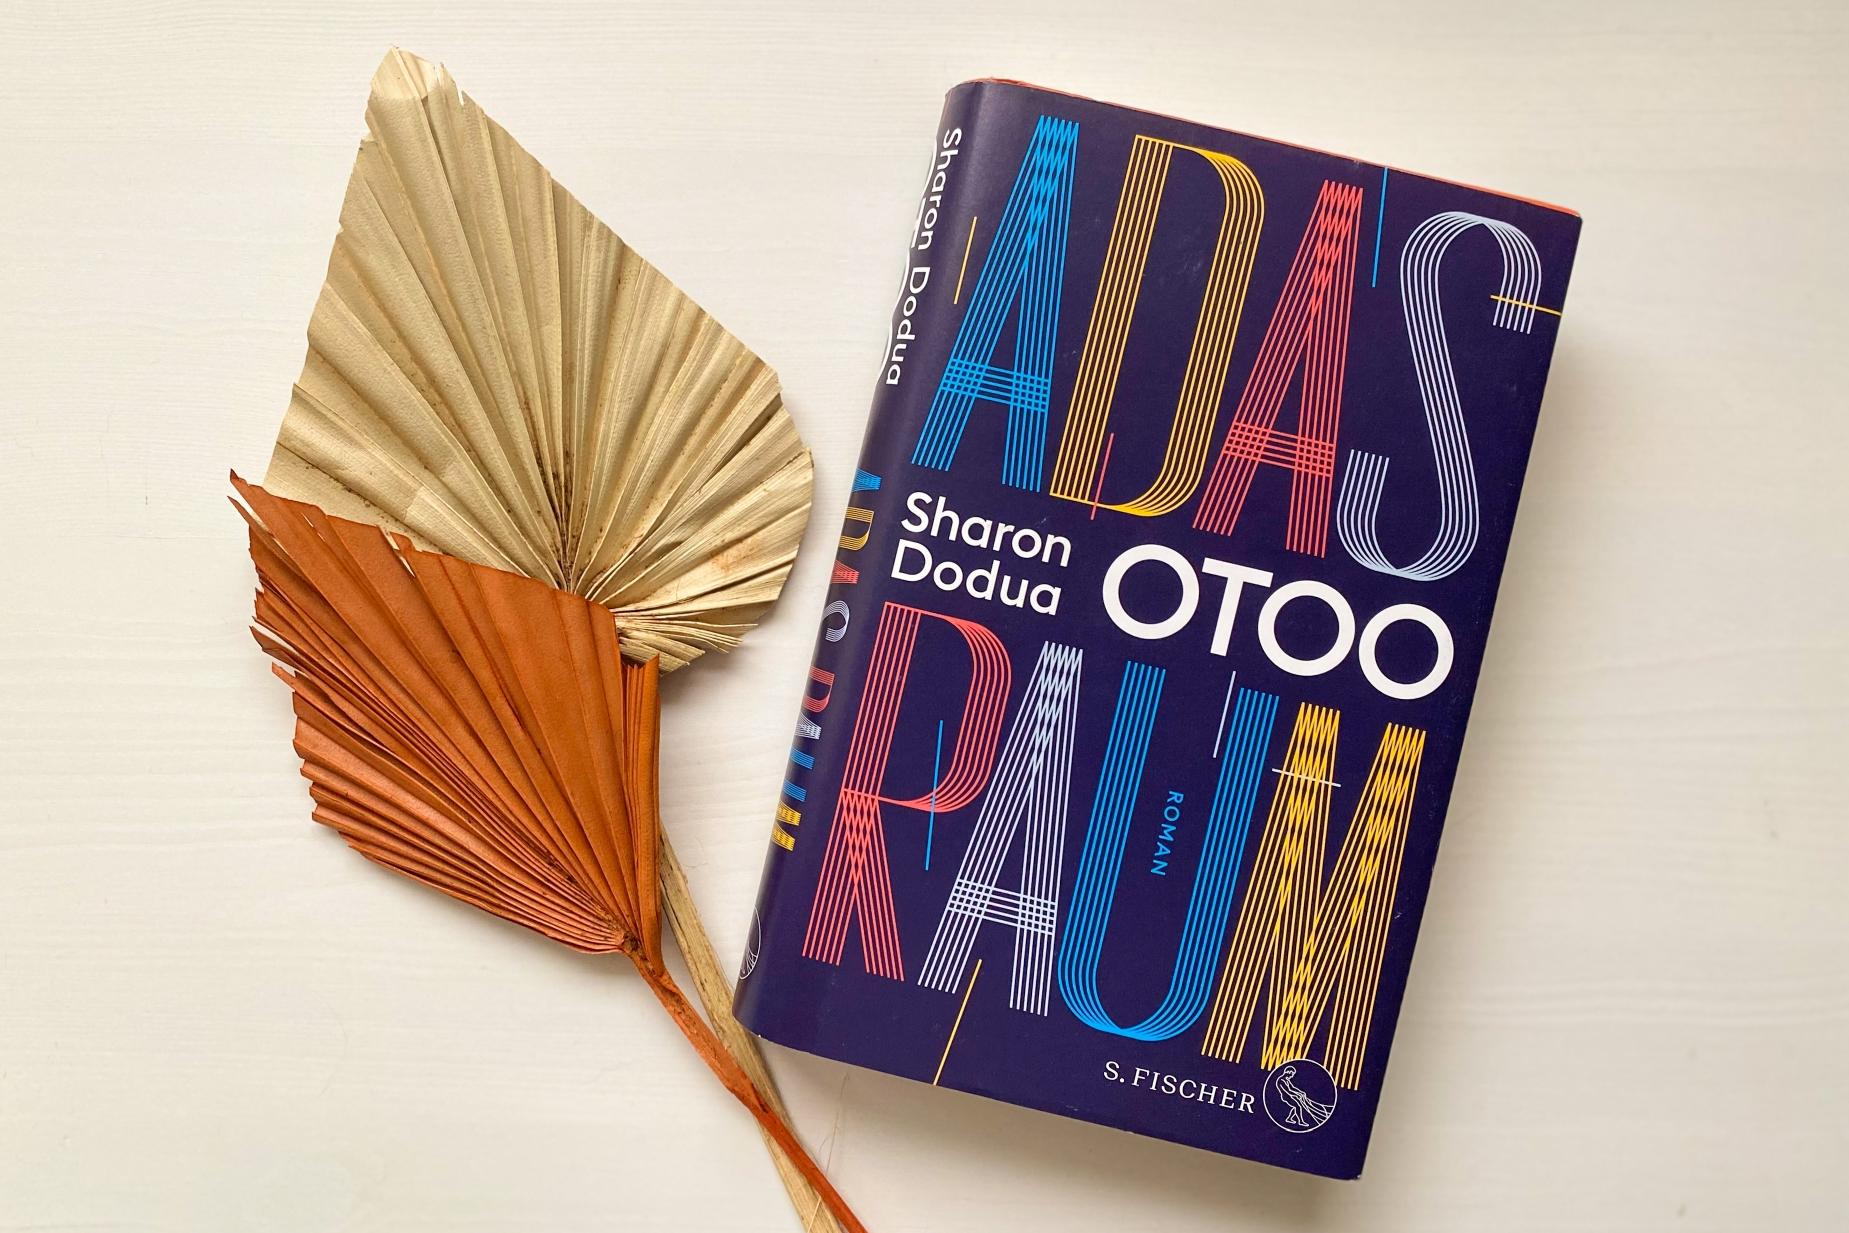 Adas Raum Sharon Dodua Otoo